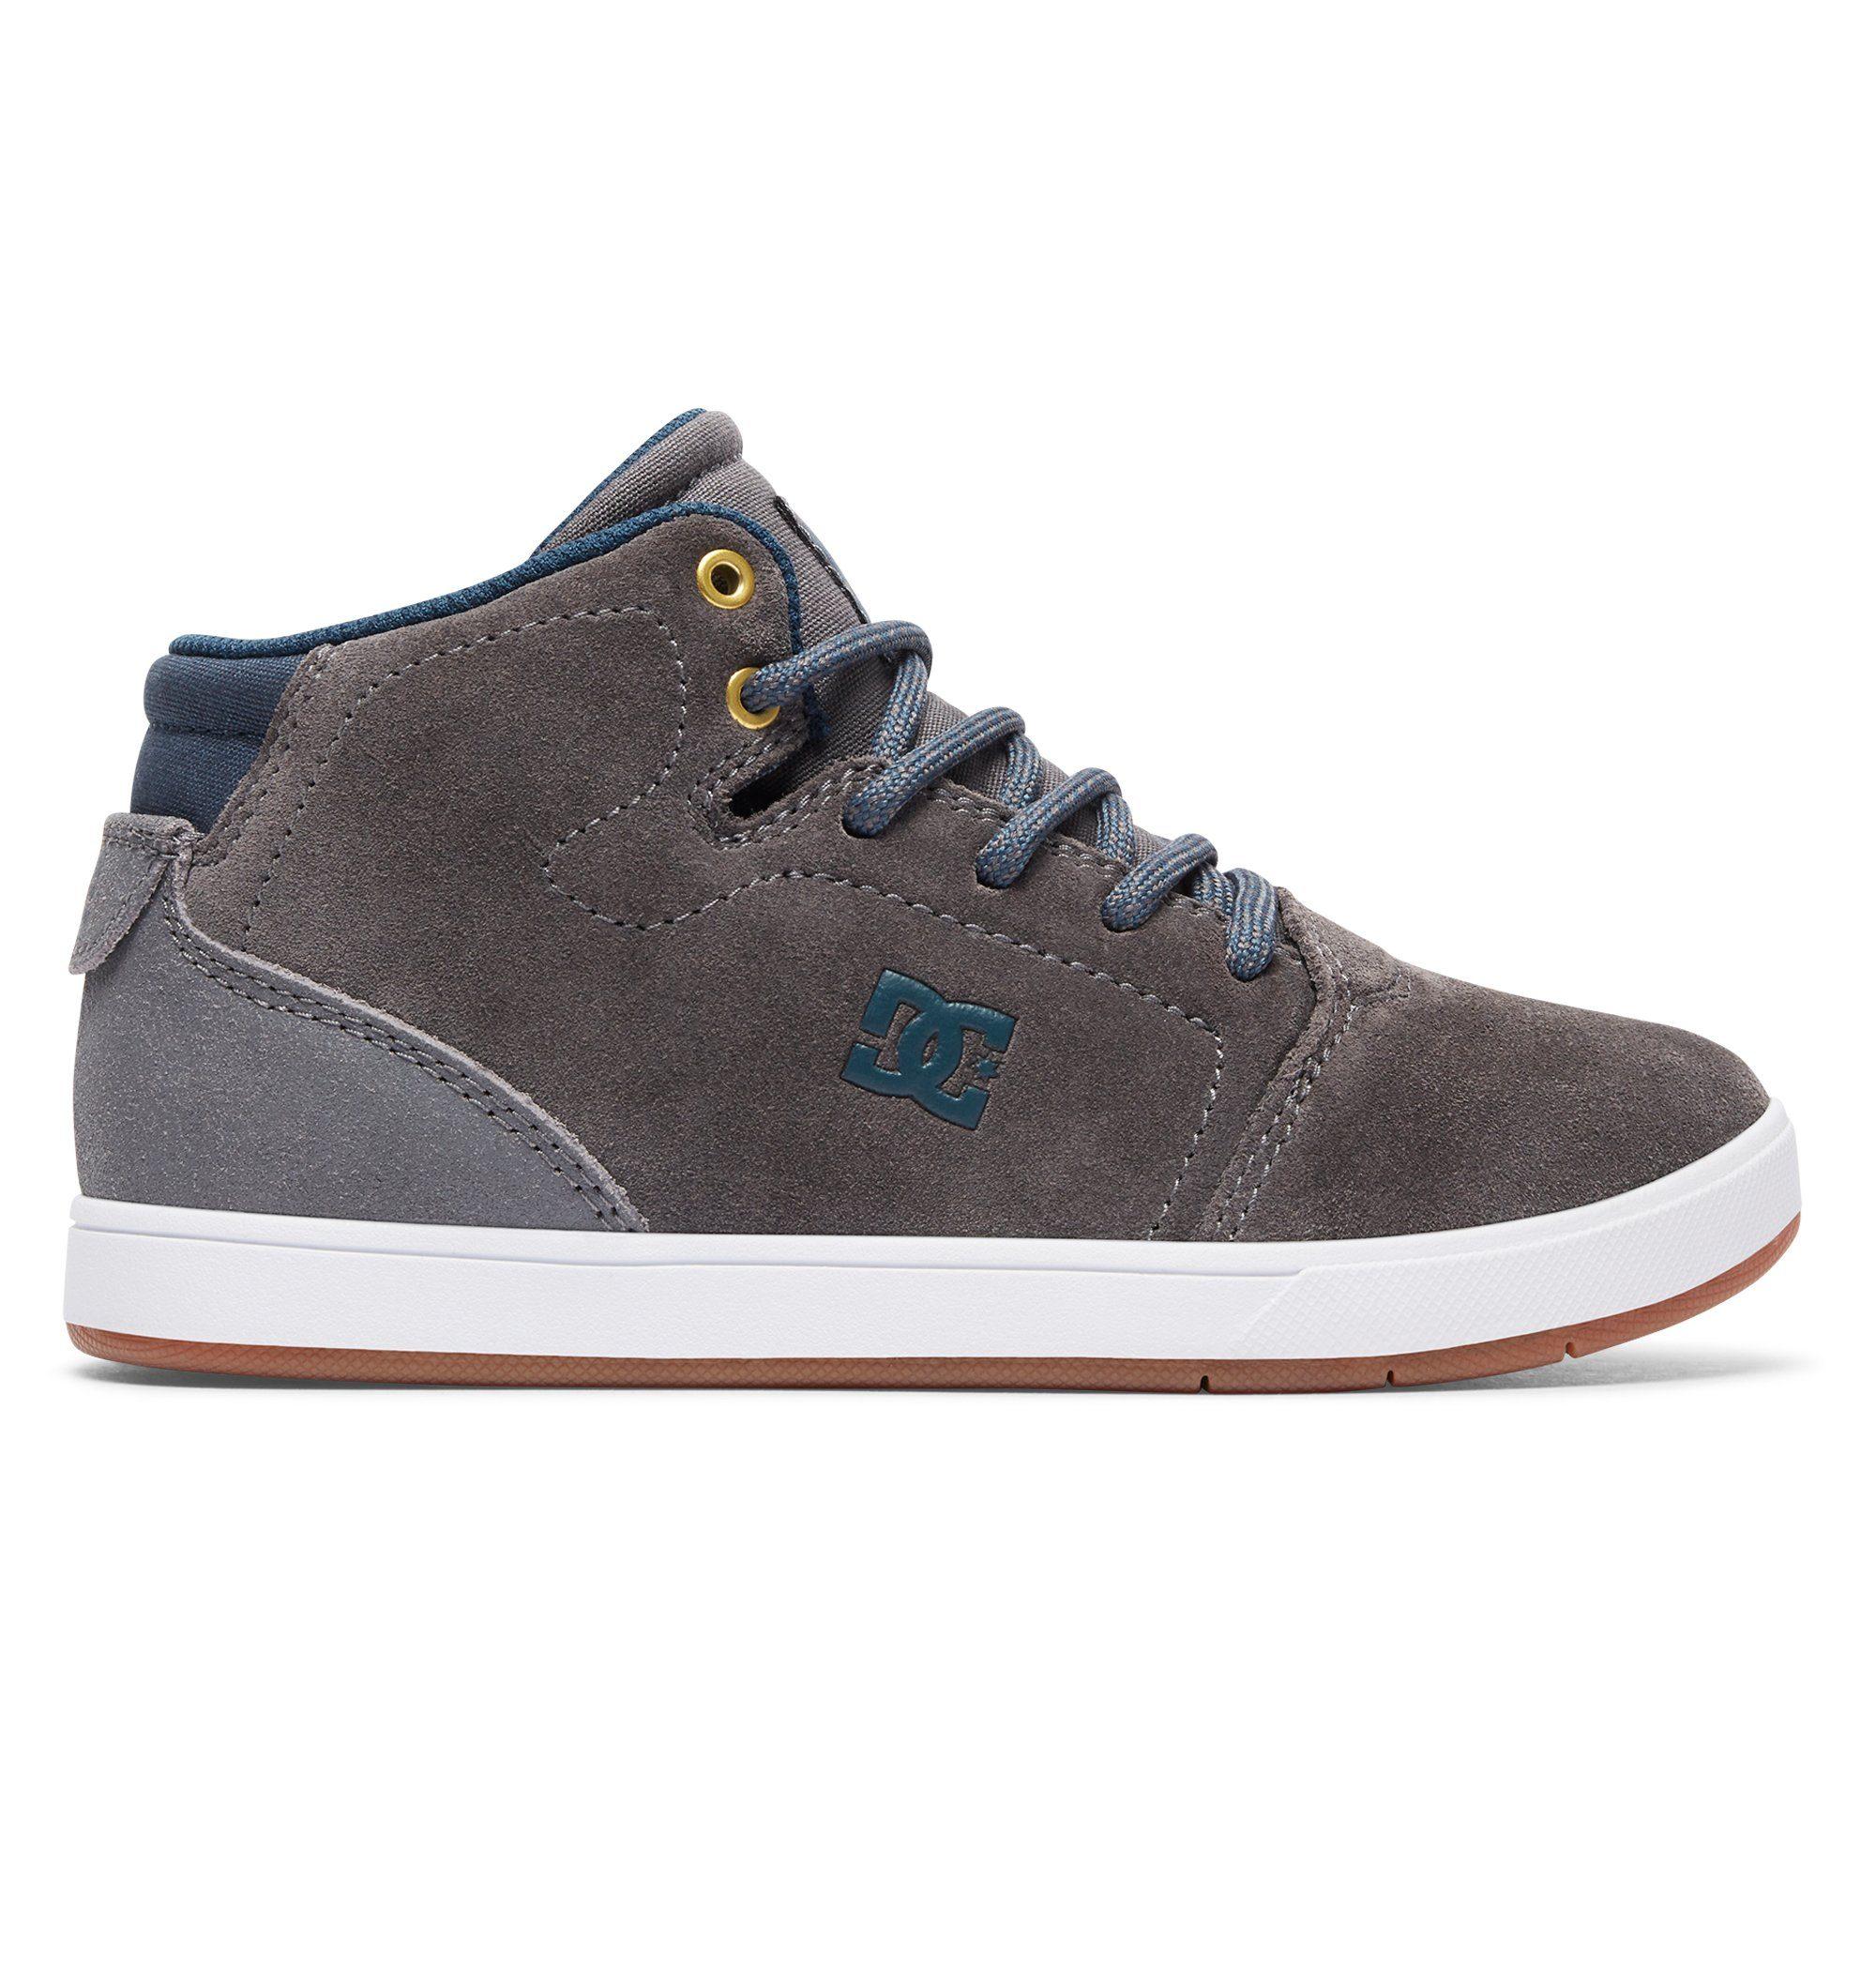 Afbeeldingsbron: DC Shoes Hoge Schoenen »Crisis«